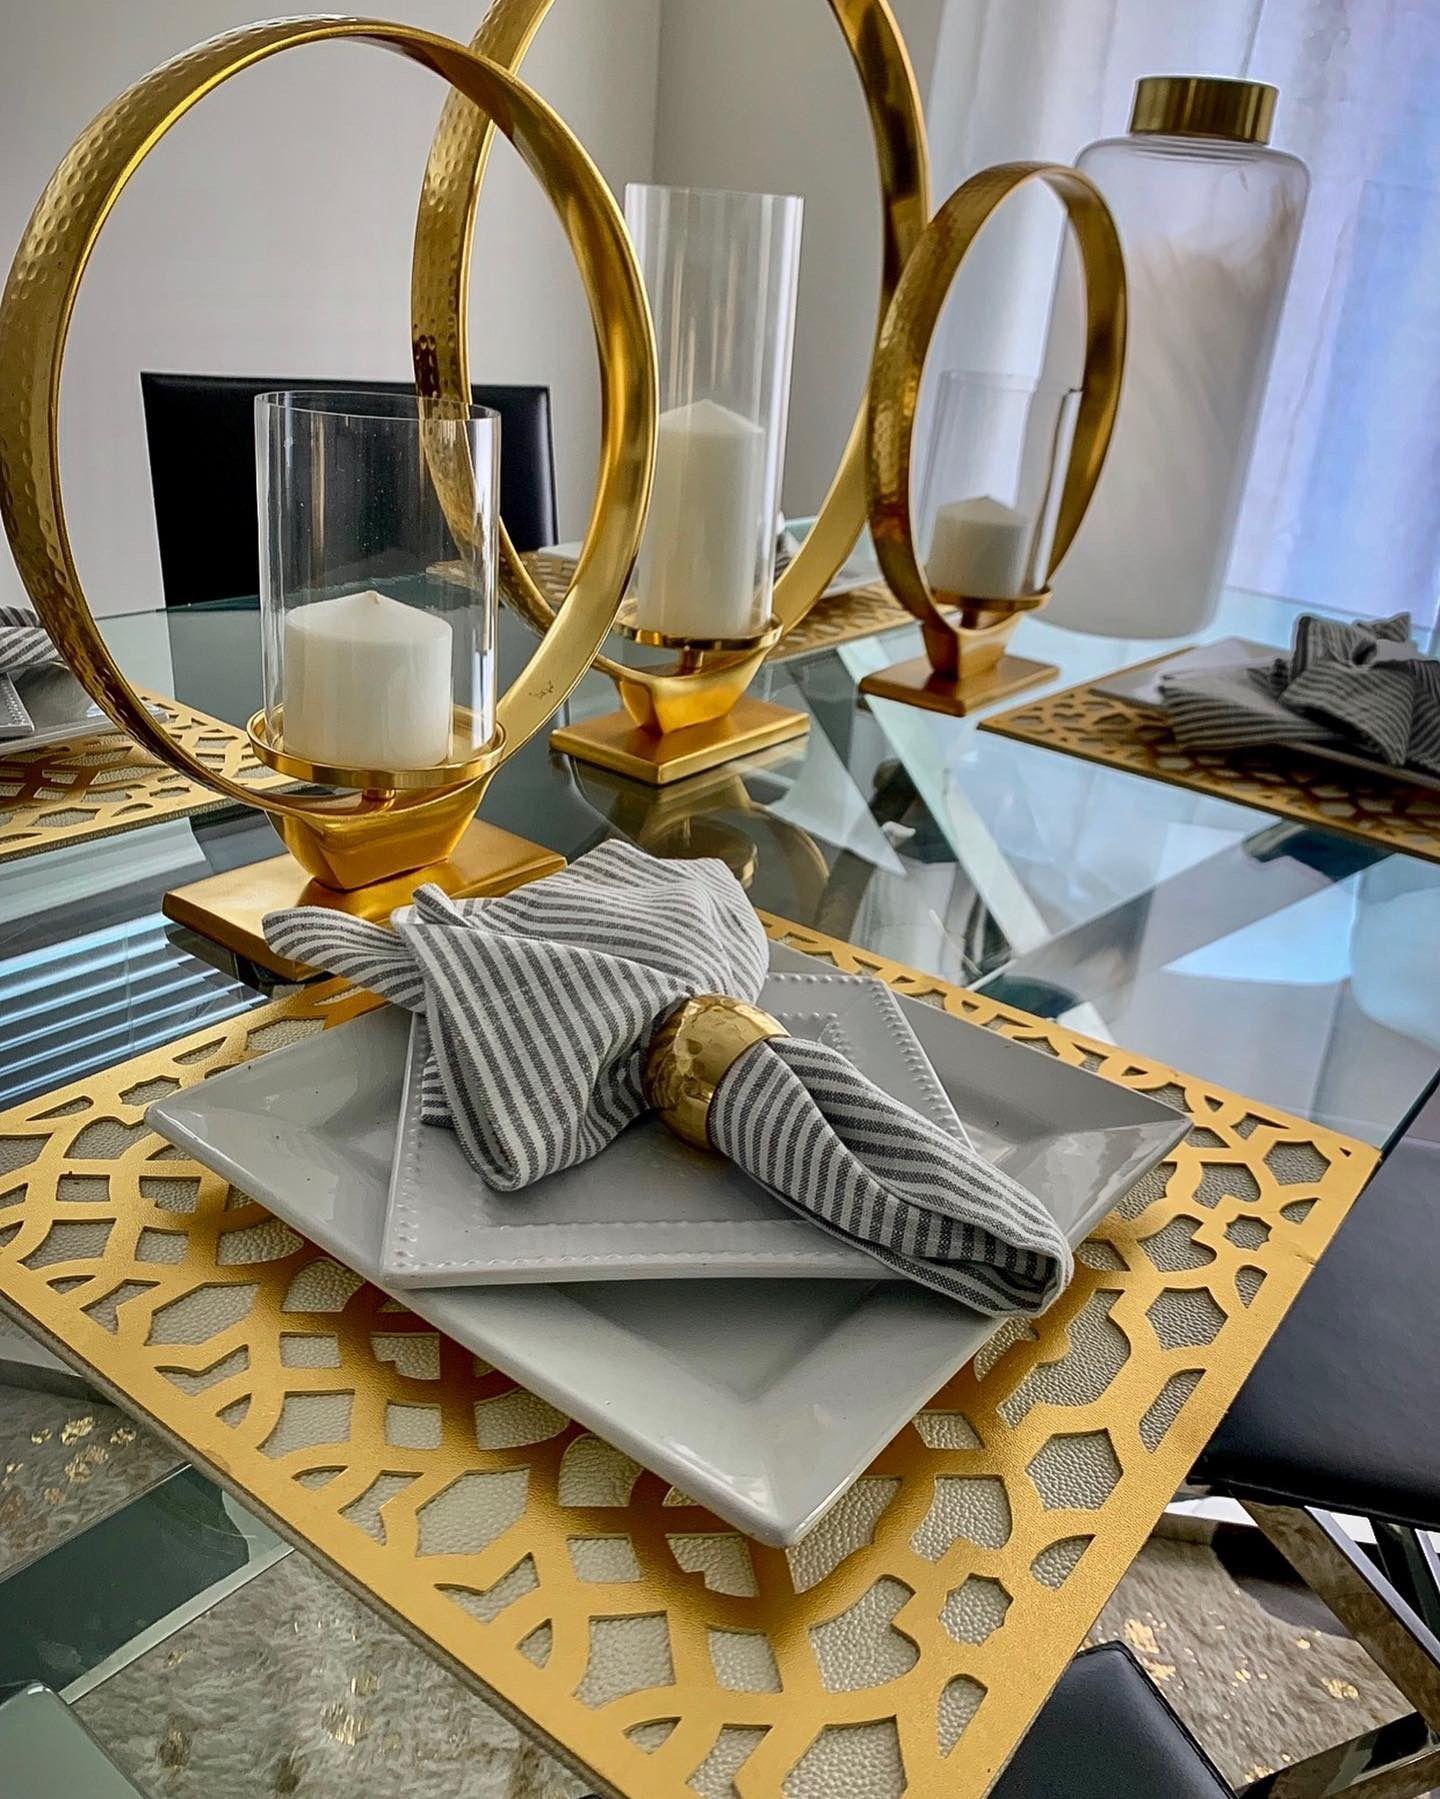 Glam Gold Decor Dining Room Table Decor Glam Gold Décor Dining Glam Gold Ro Décor Dining Room Table Decor Gold Dining Room Table White Dining Room Decor